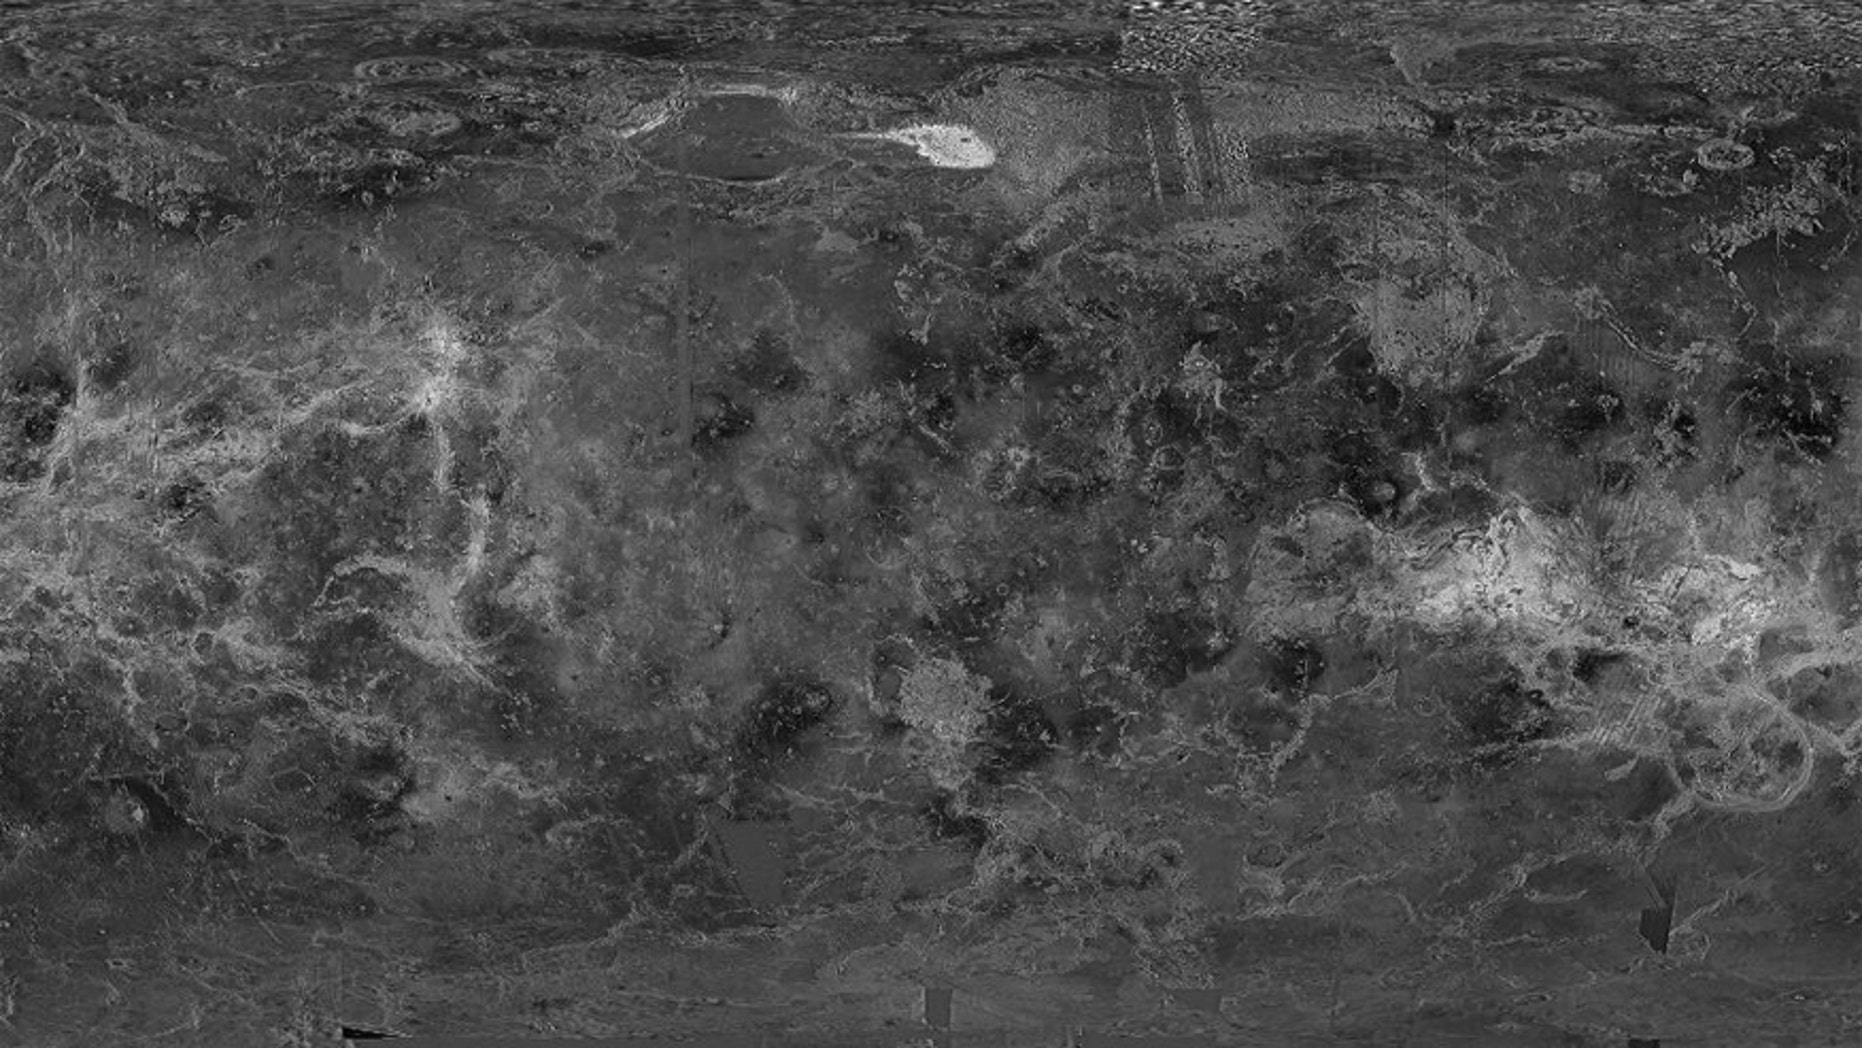 Alien hunters claim Venus has buildings | Fox News on